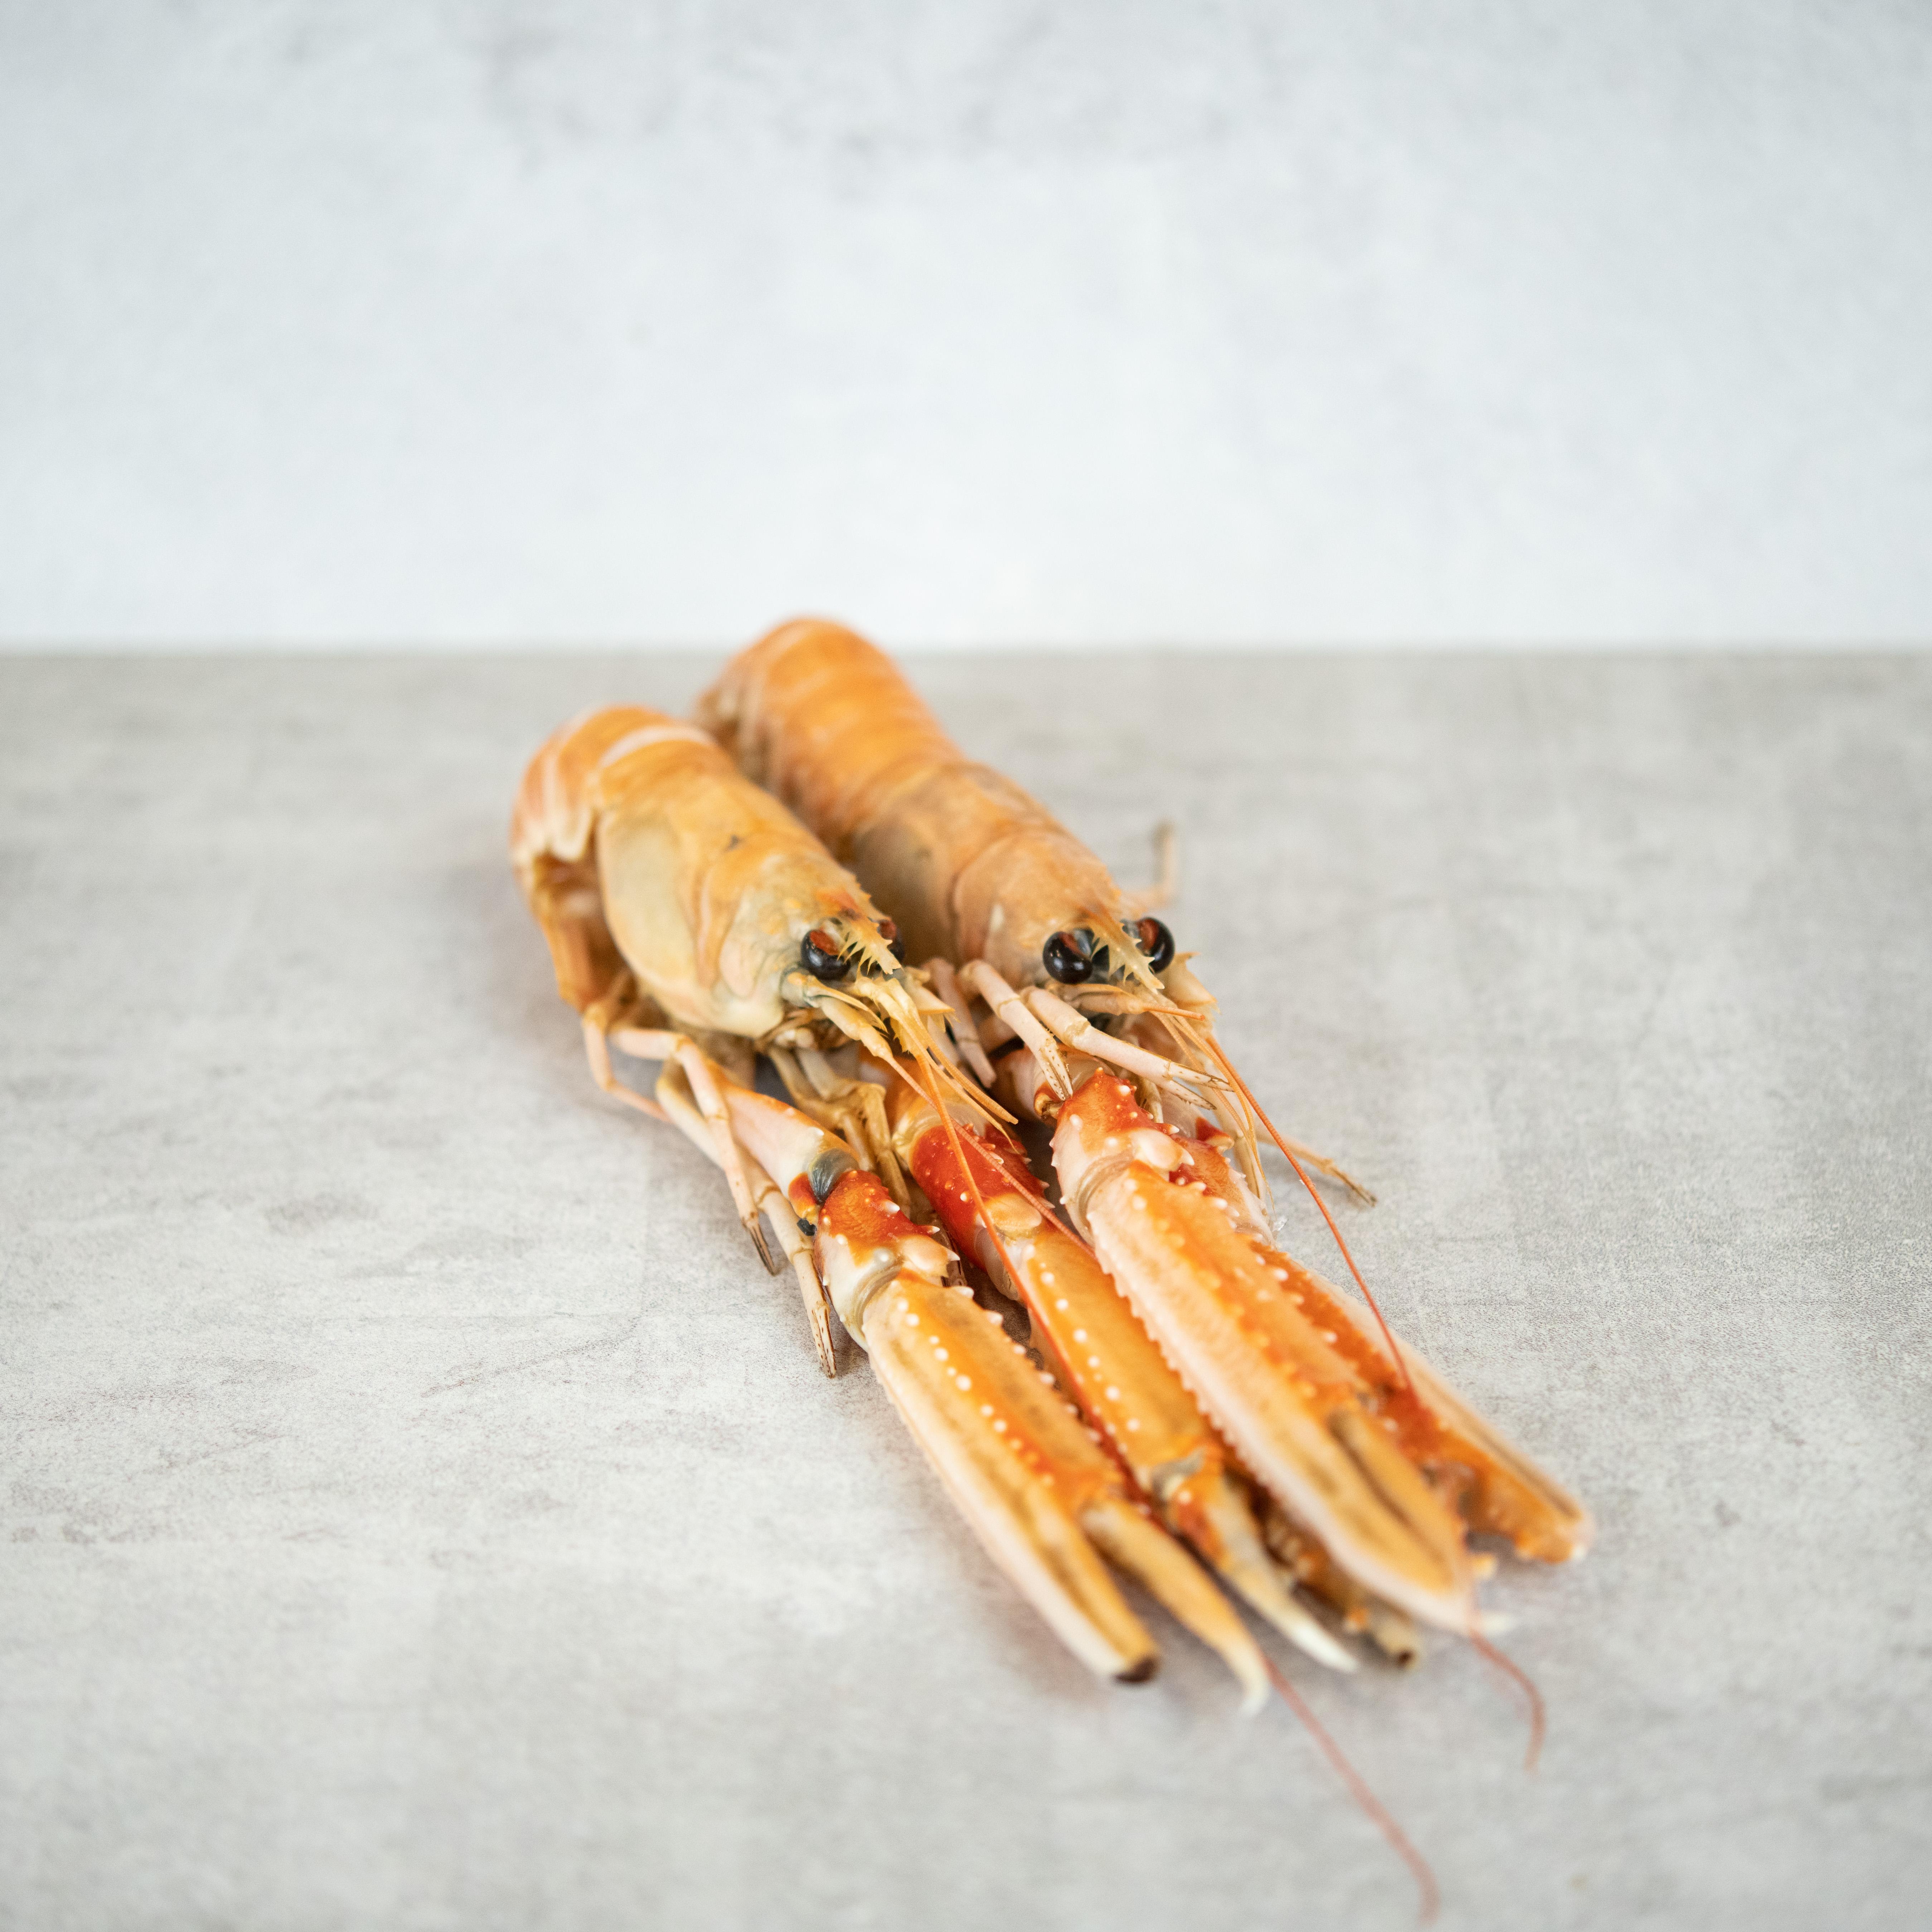 Kaisergranat_Langostinos_Markthalle20_Seafood